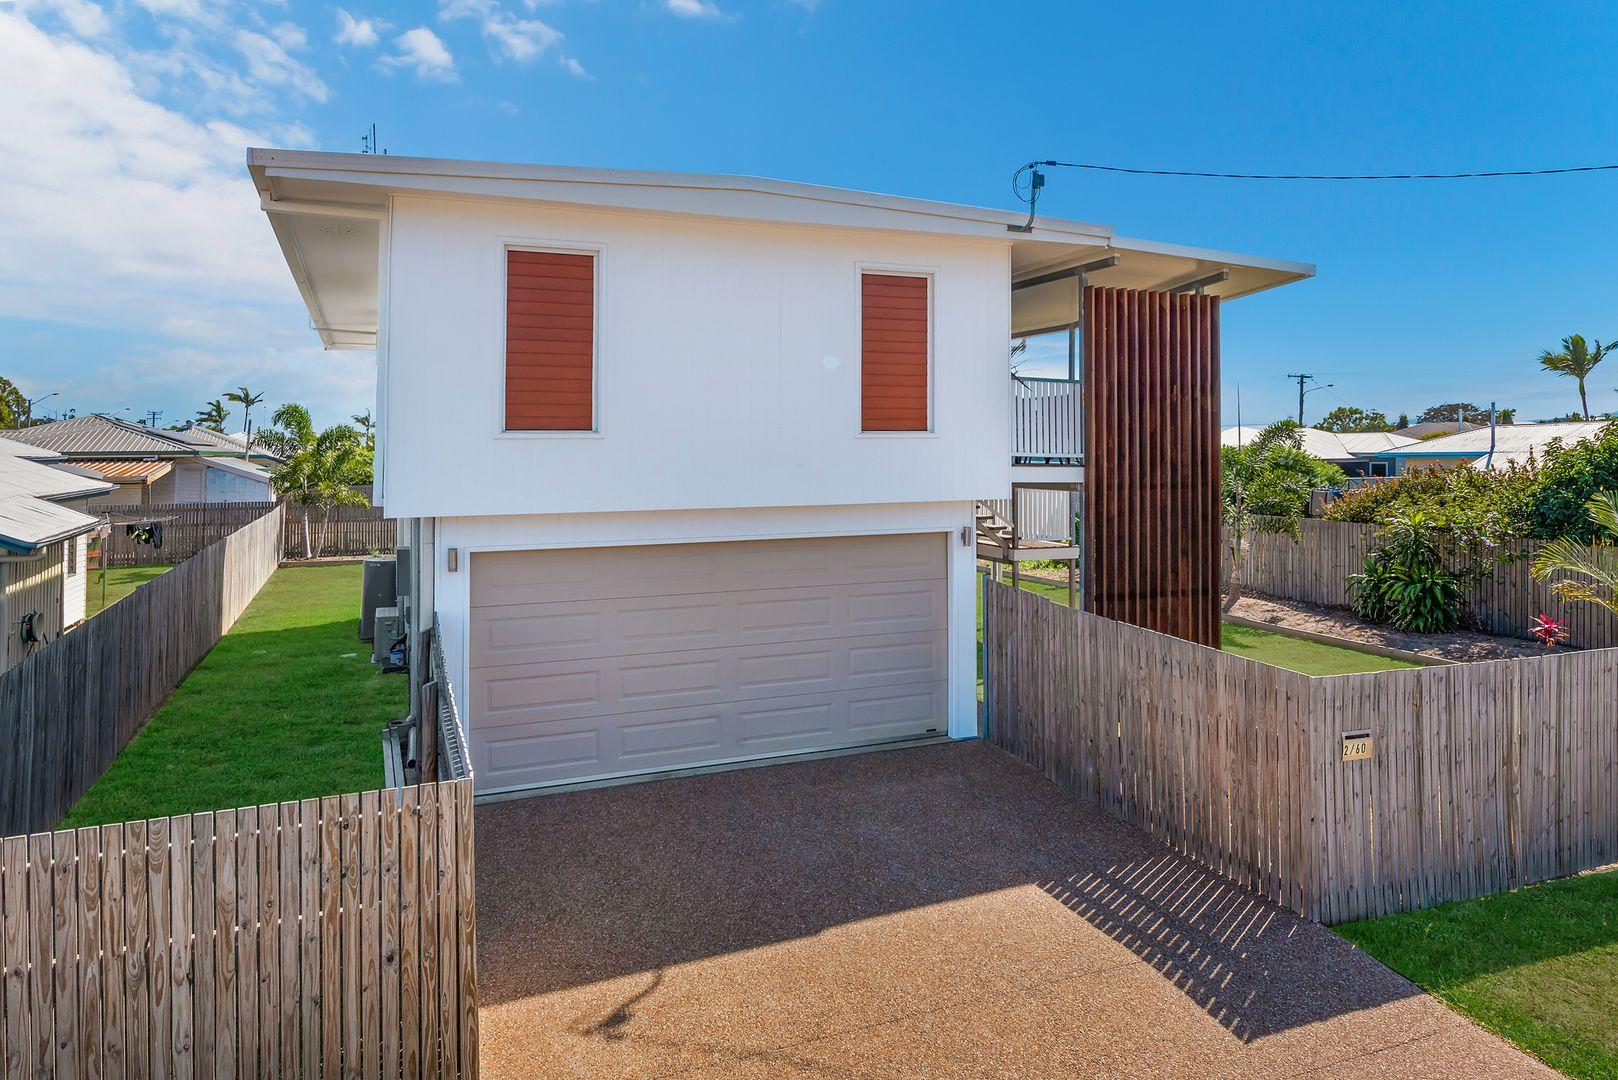 2/60 Meenan Street, Garbutt QLD 4814, Image 0